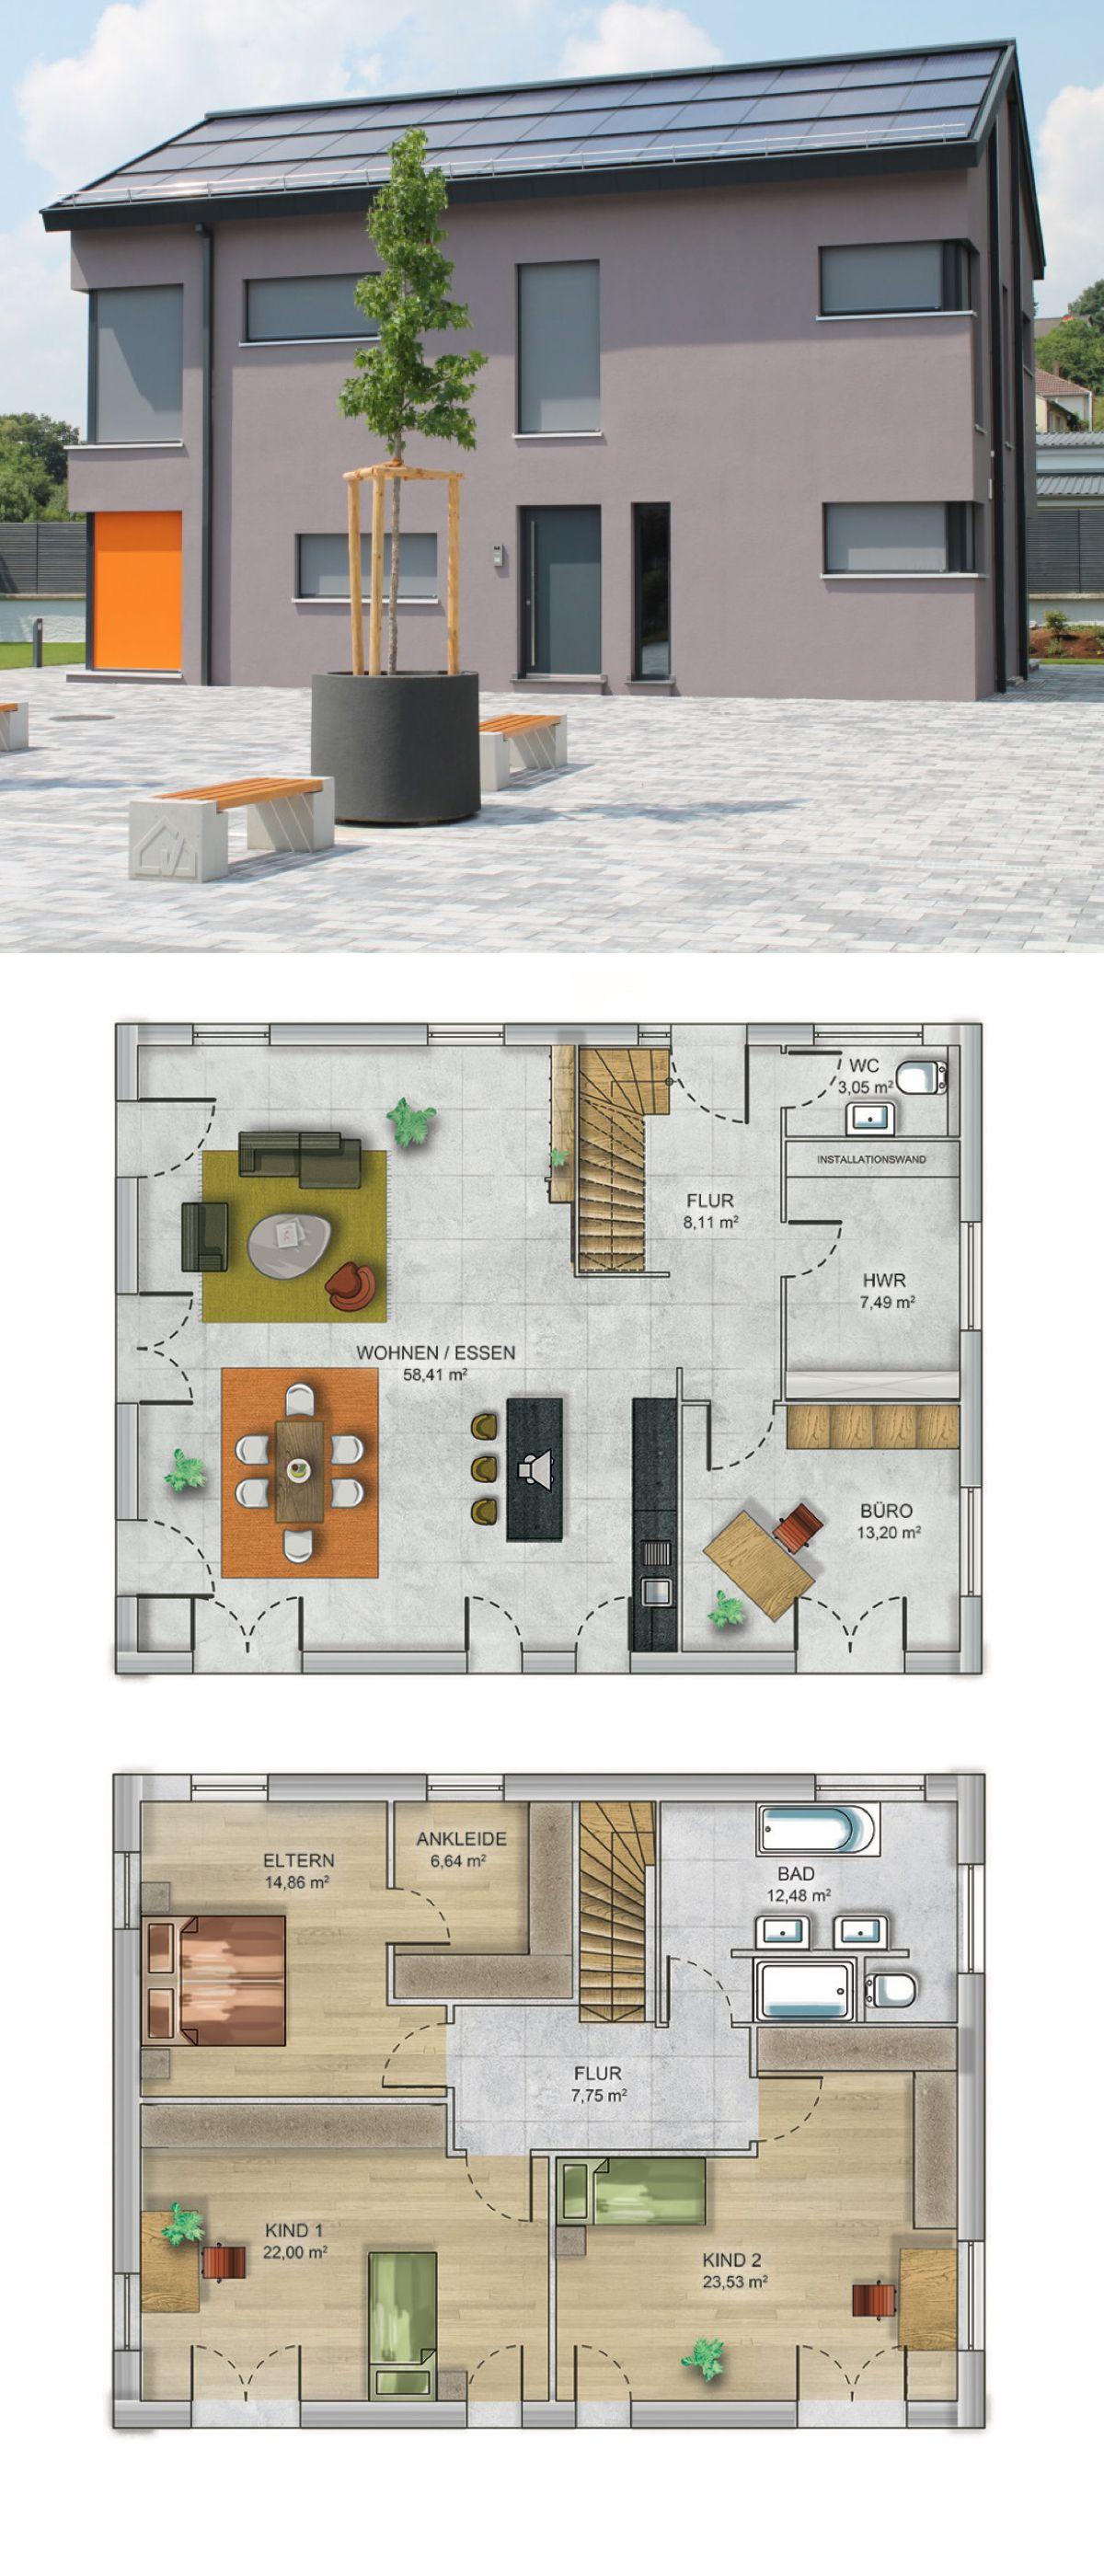 Satteldach Haus Modern Mit Putzfassade Grau Massives Fertighaus